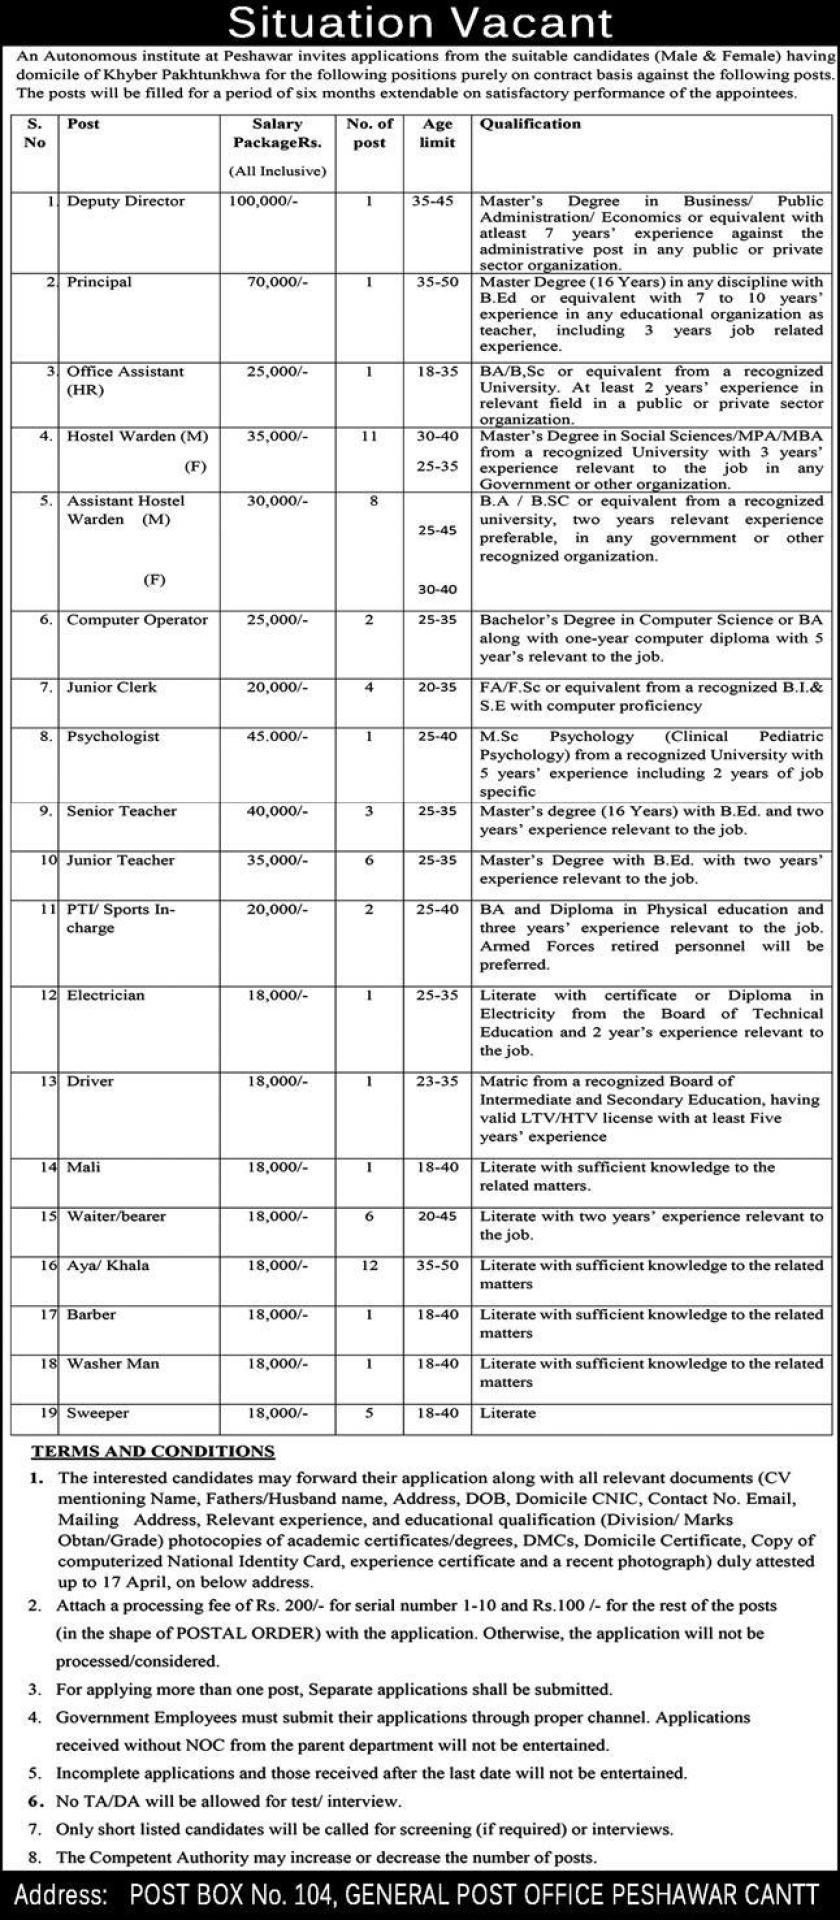 Public Sector Organization PO Box 104 Peshawar Jobs 2021